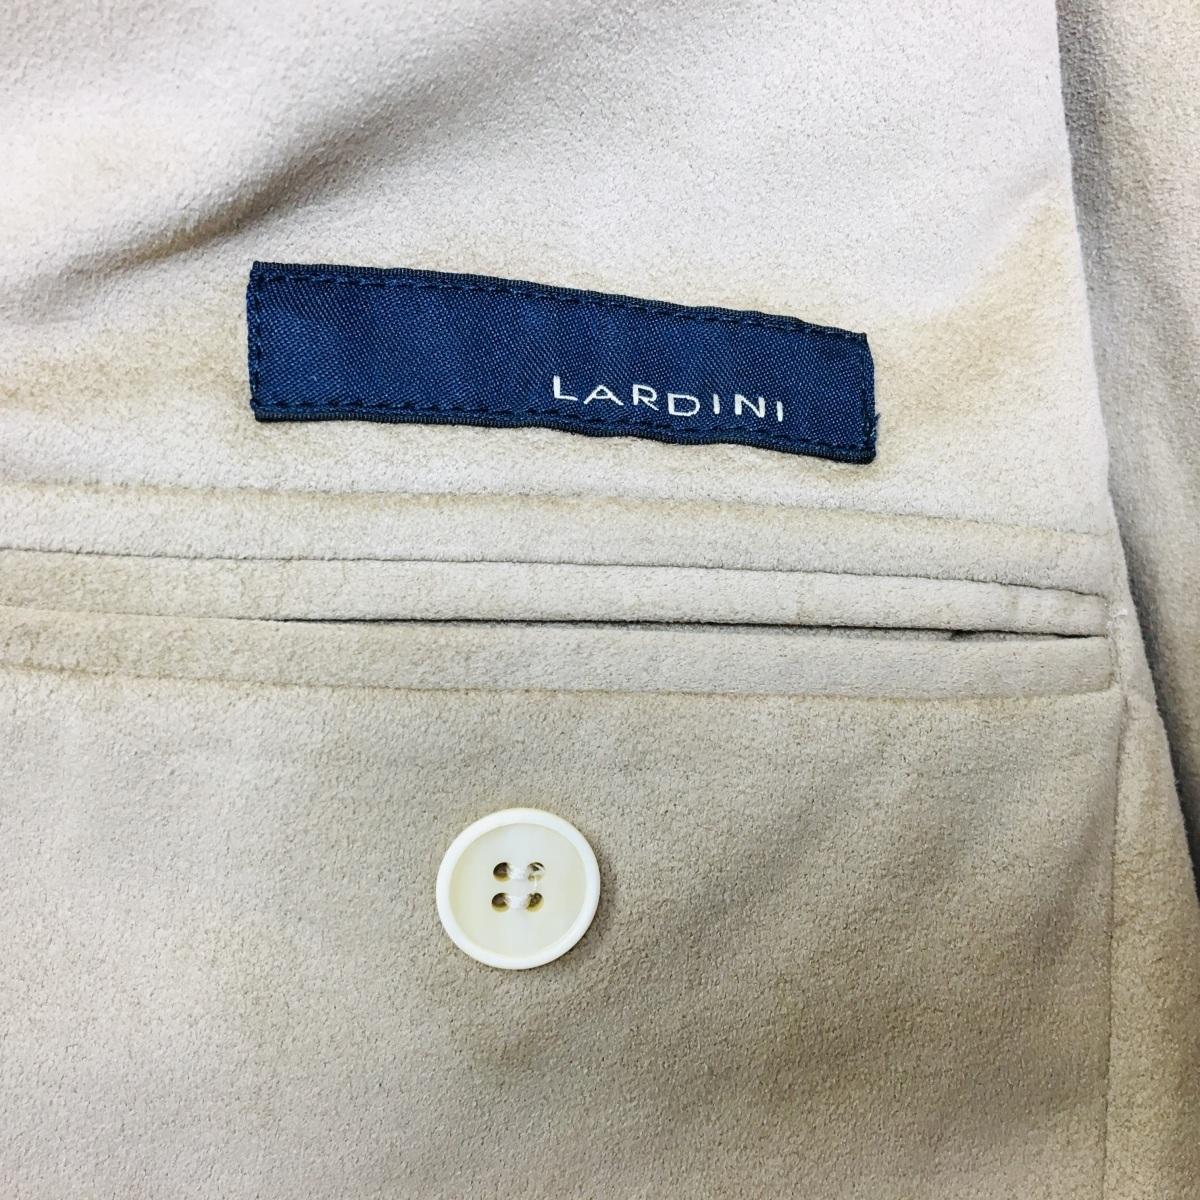 LARDINI ラルディーニ レザー風 ALCANTARA メンズ サファリ ジャケット 46 ベージュ系_画像4